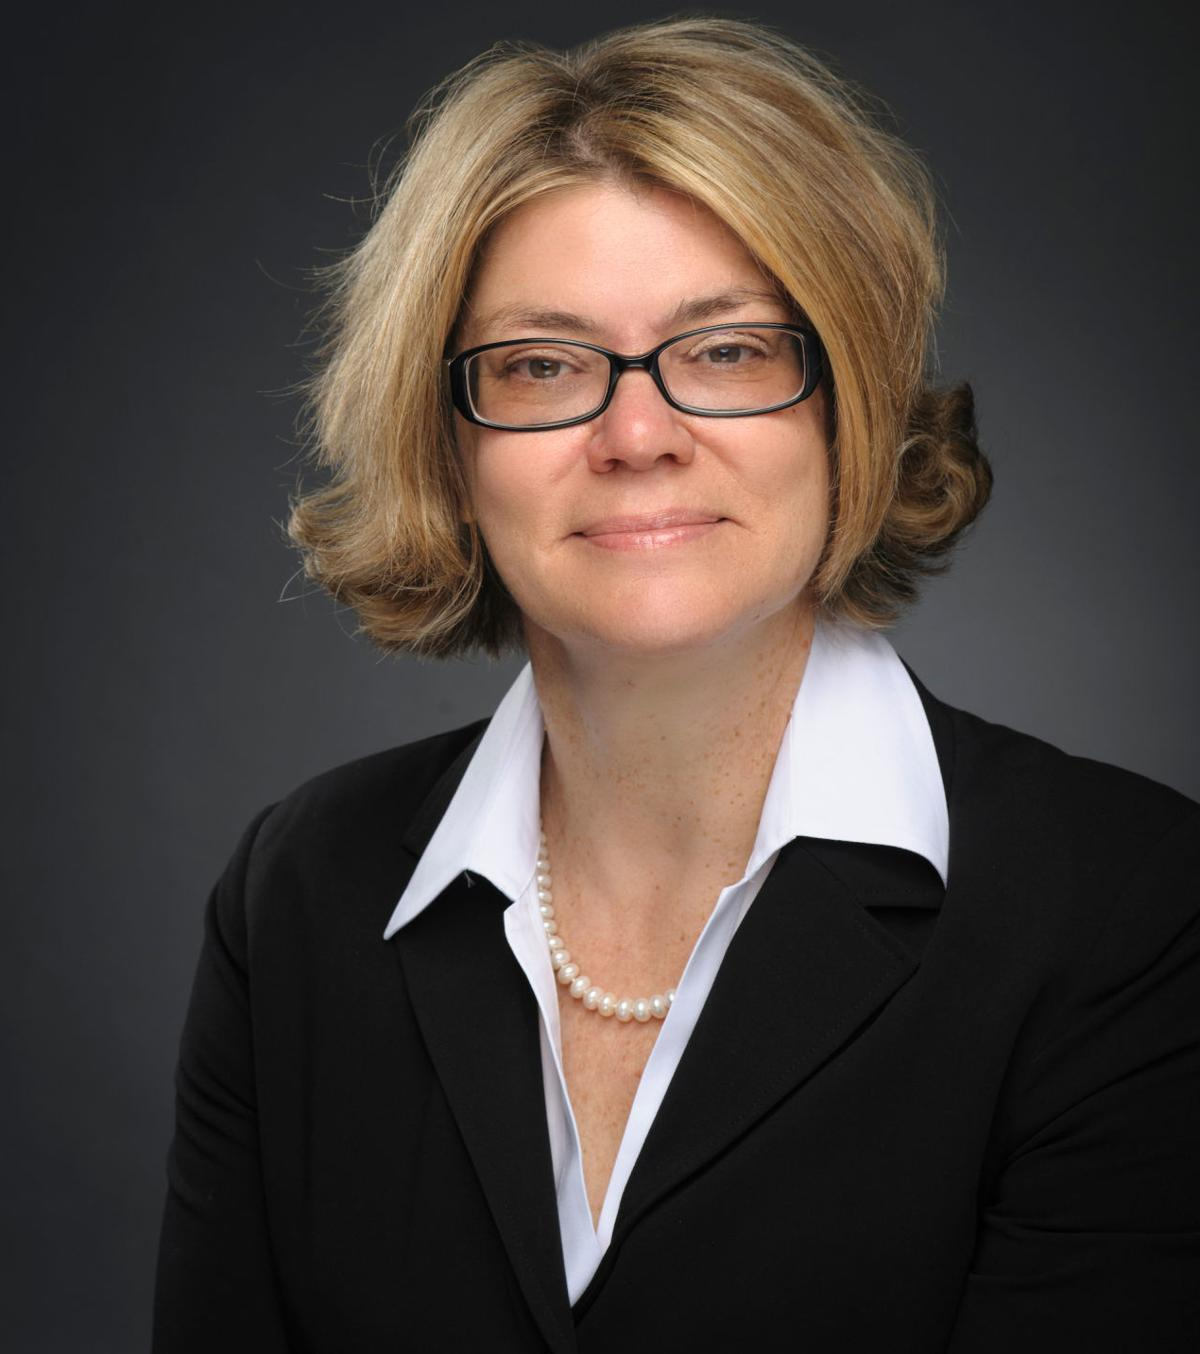 Renee Reijo Pera, MSU